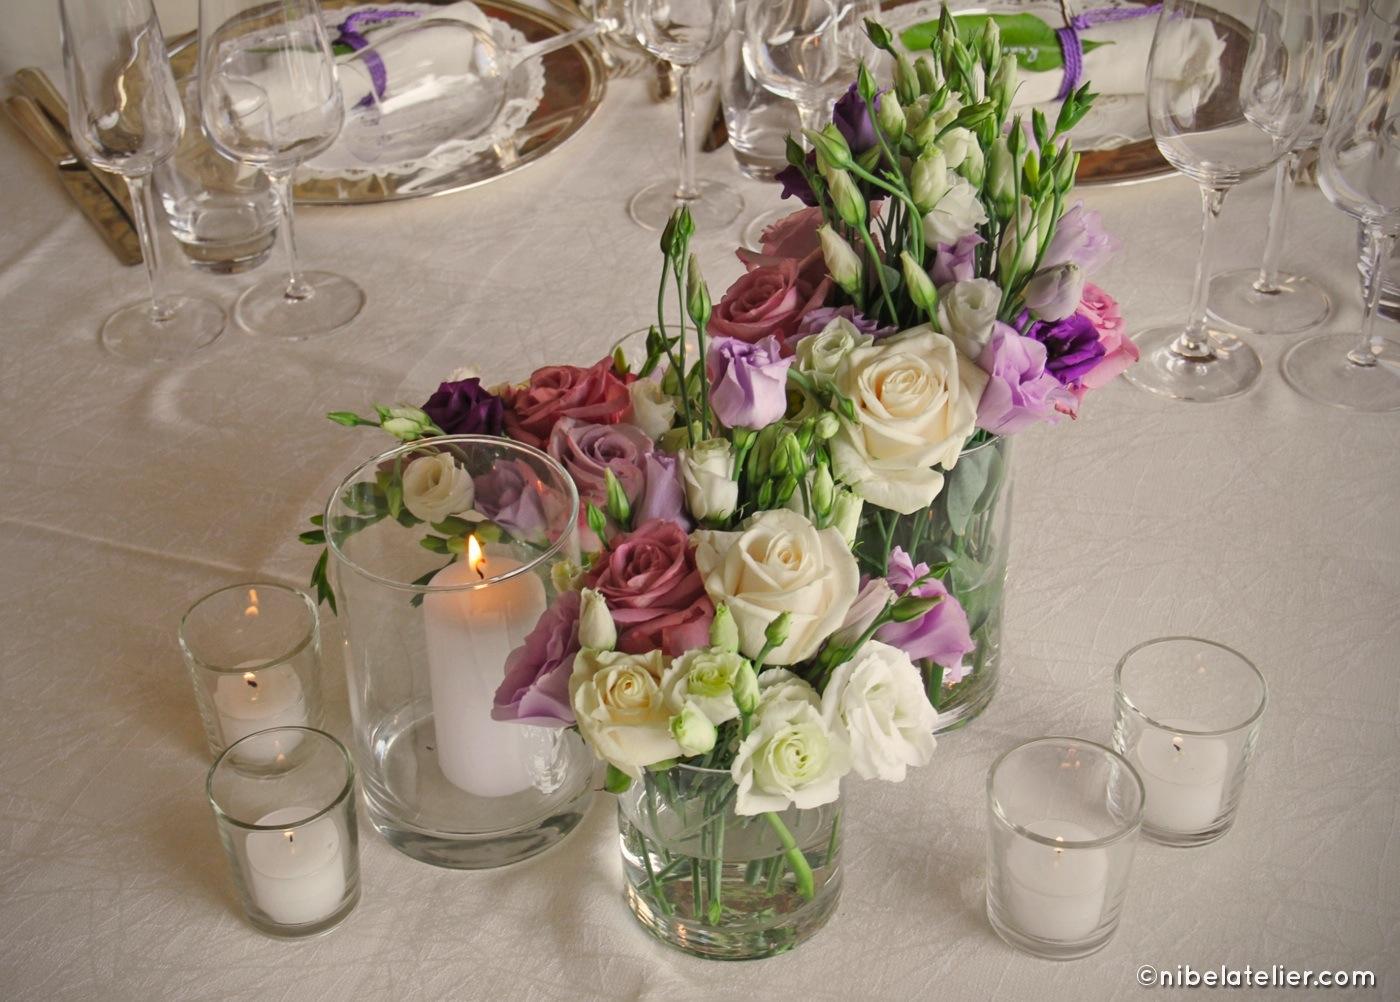 007-composizione-floreale-matrimonio